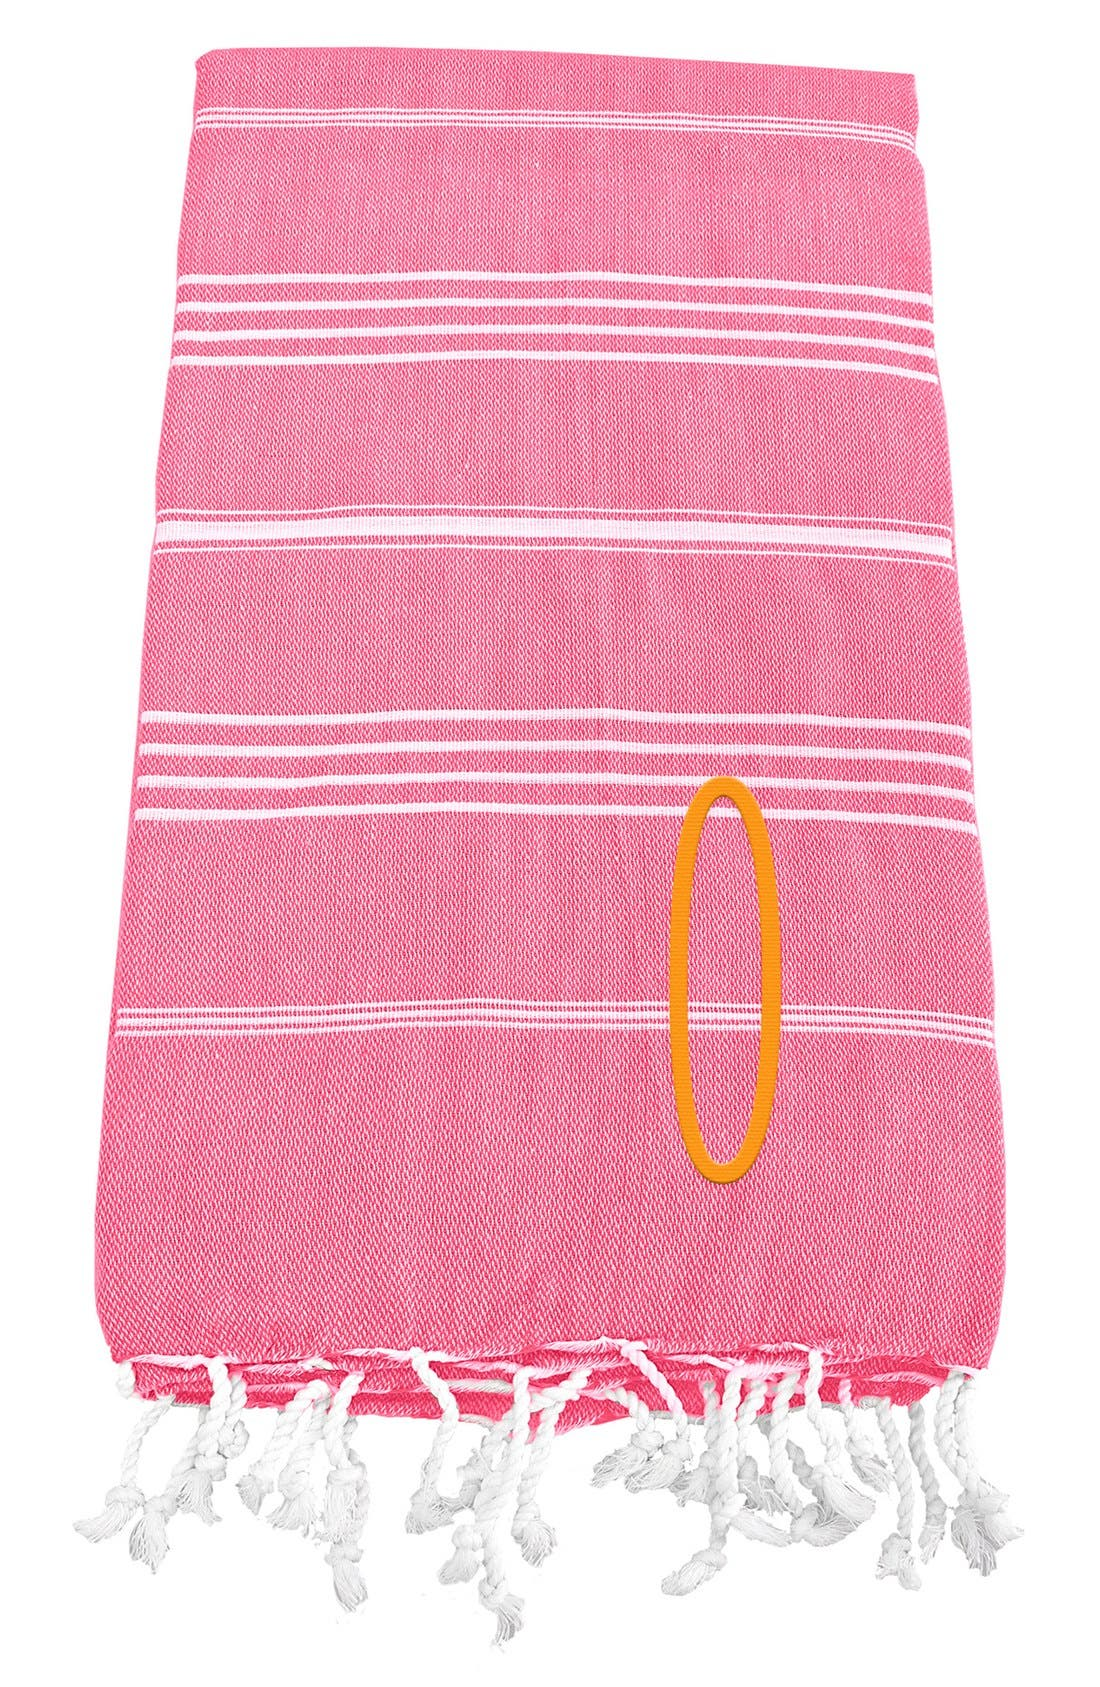 Monogram Turkish Cotton Towel,                             Main thumbnail 151, color,